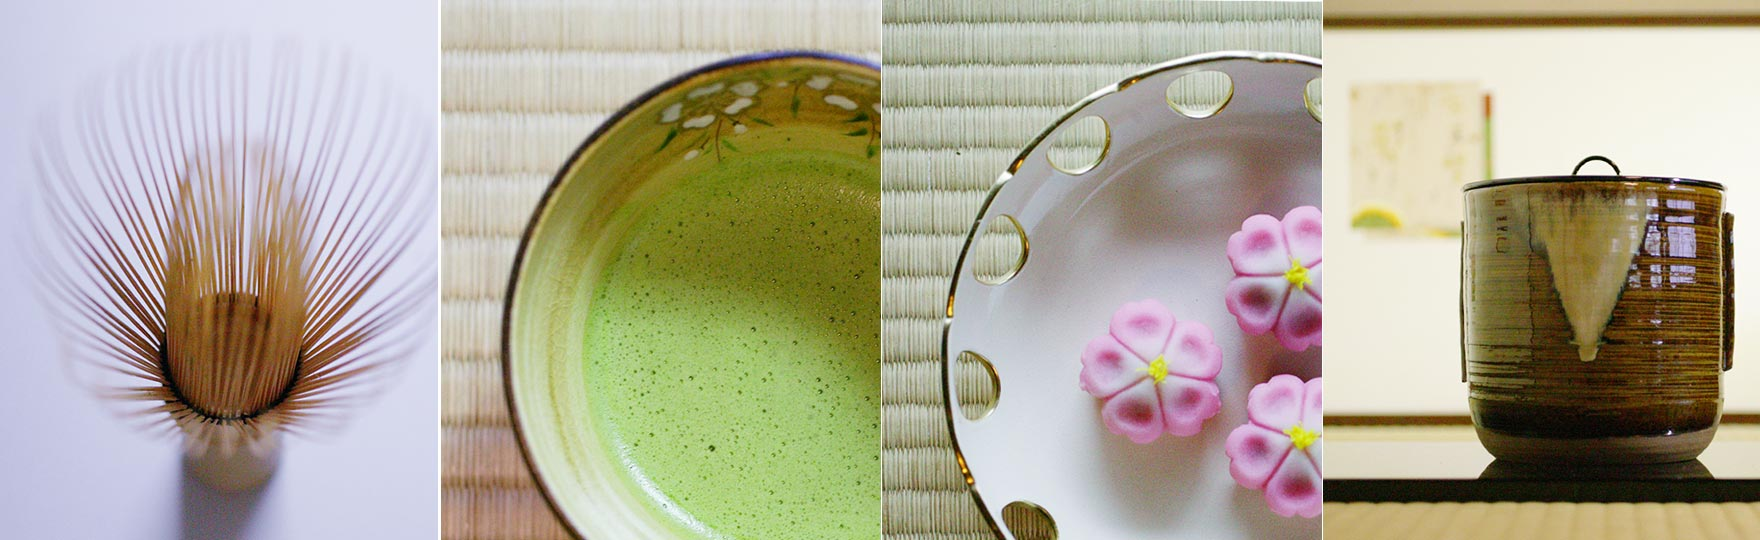 HiSUi TOKYO BLOG「徒然なる和の日常」